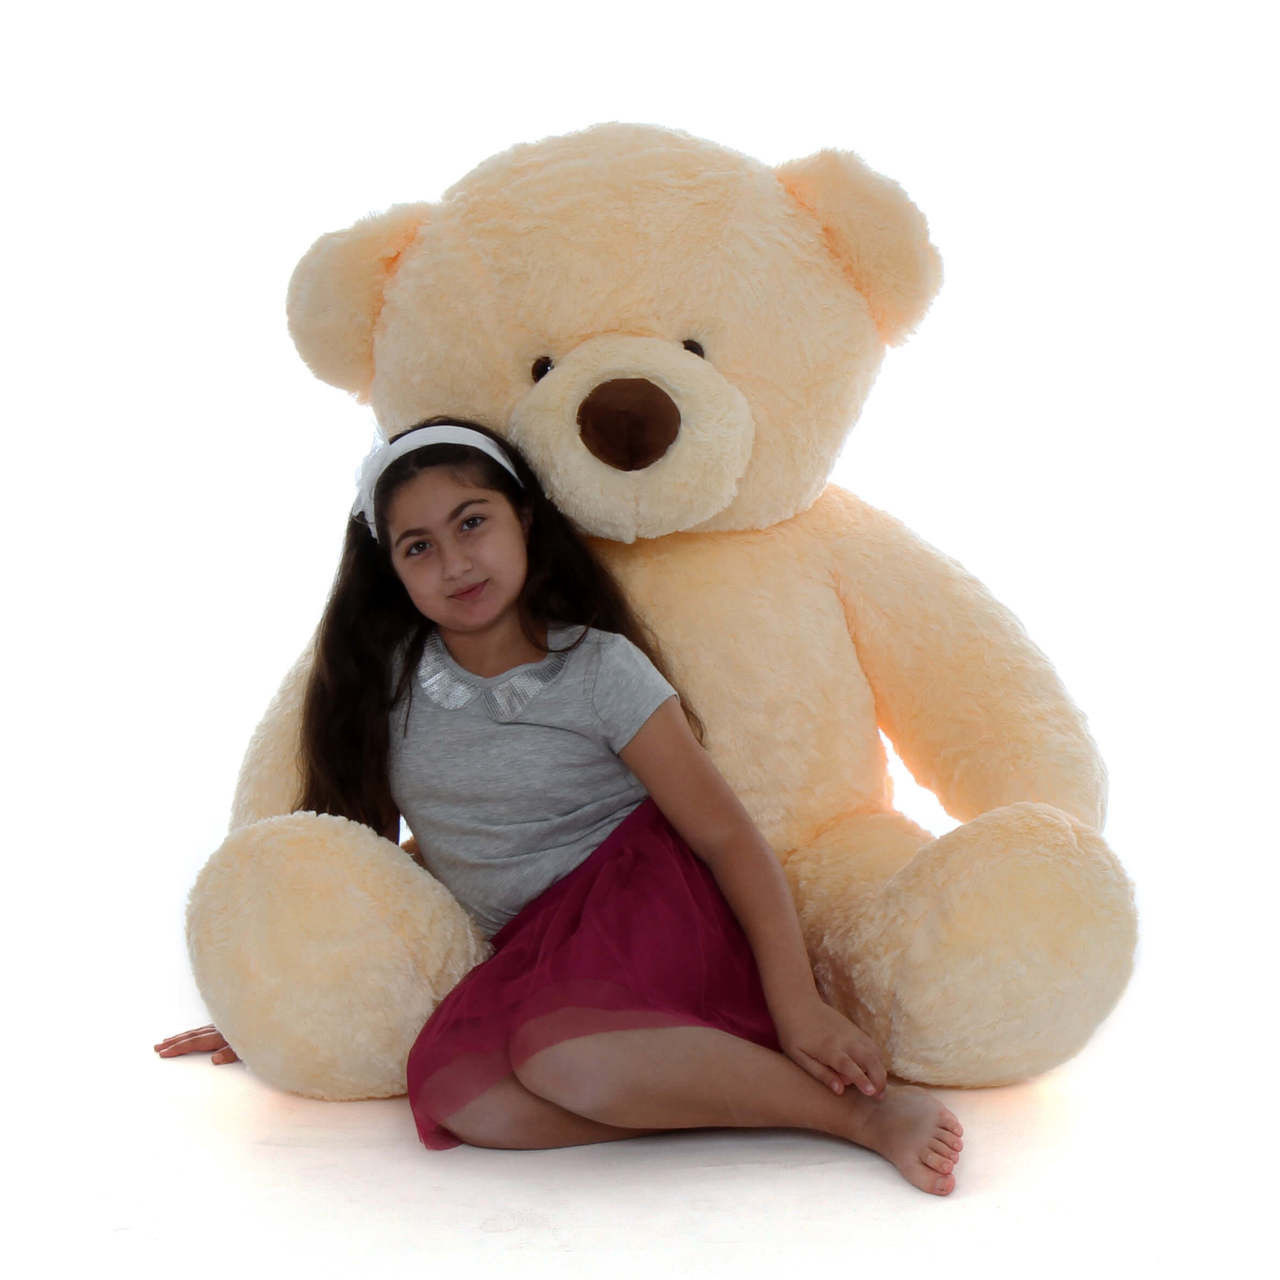 5ft smiley Chubs Vanilla Teddy bear